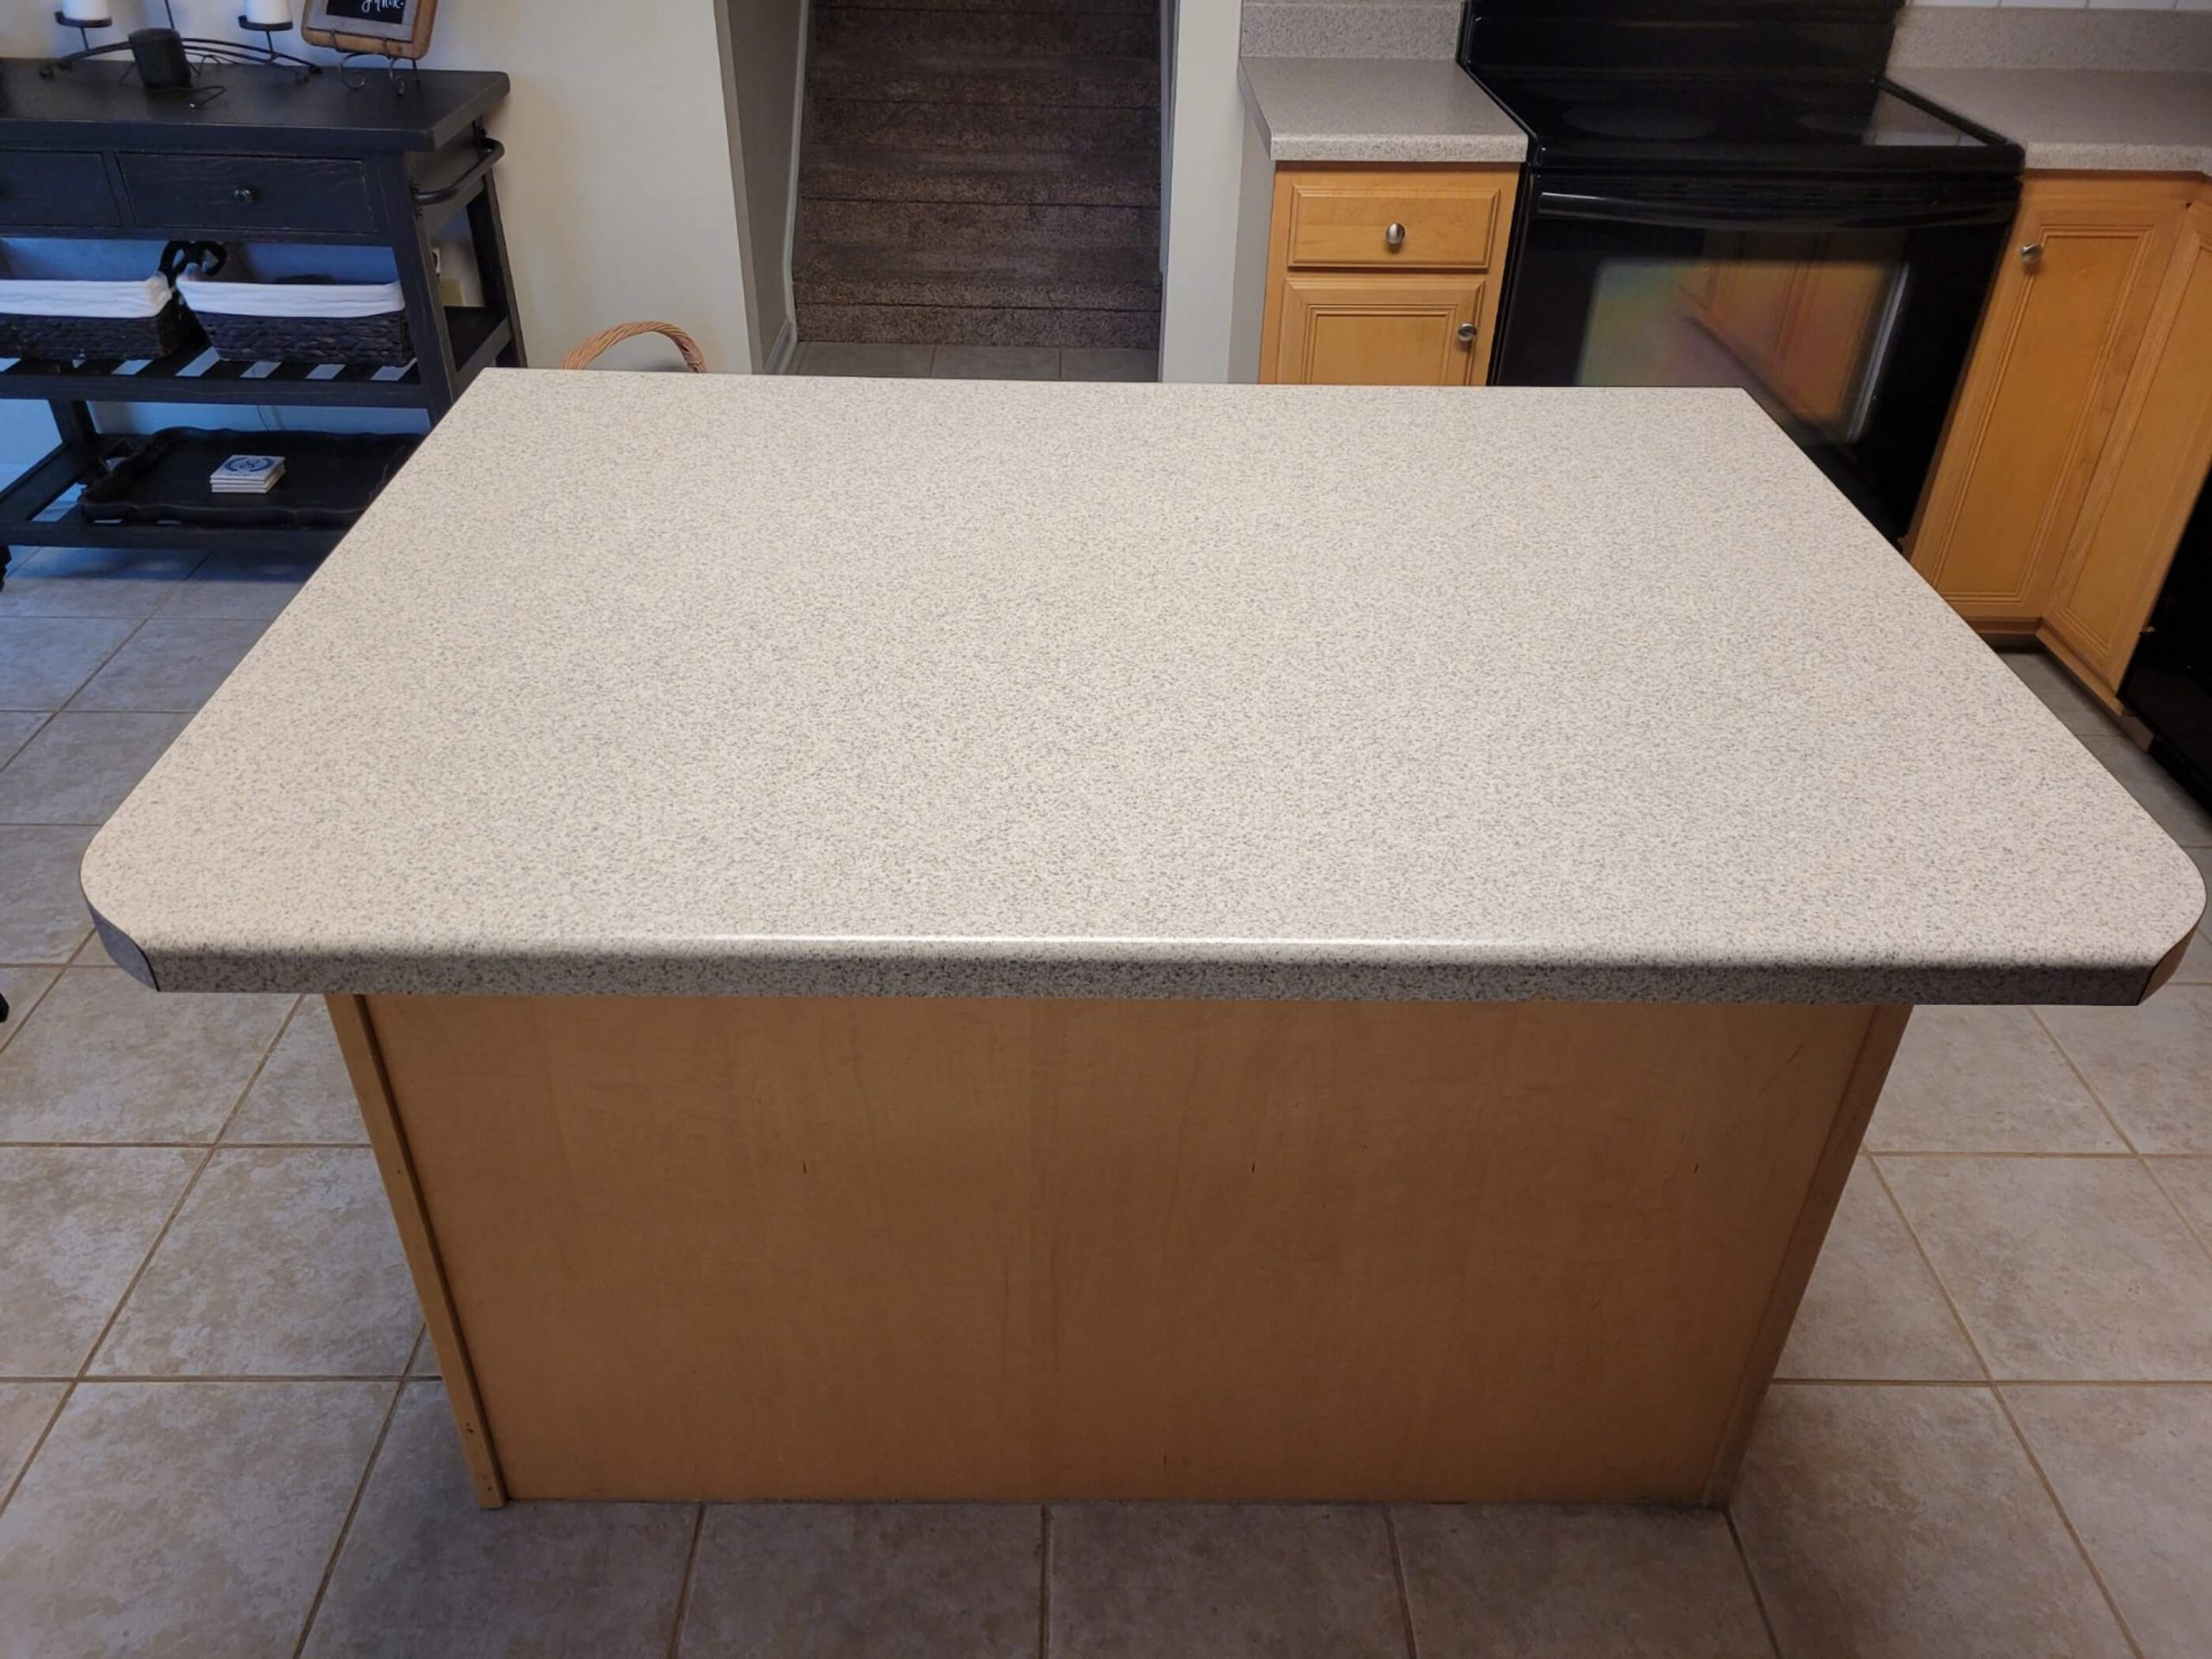 The Resurfacing Specialist   Bathtub Refinishing, Kitchen Remodeling, Repairs